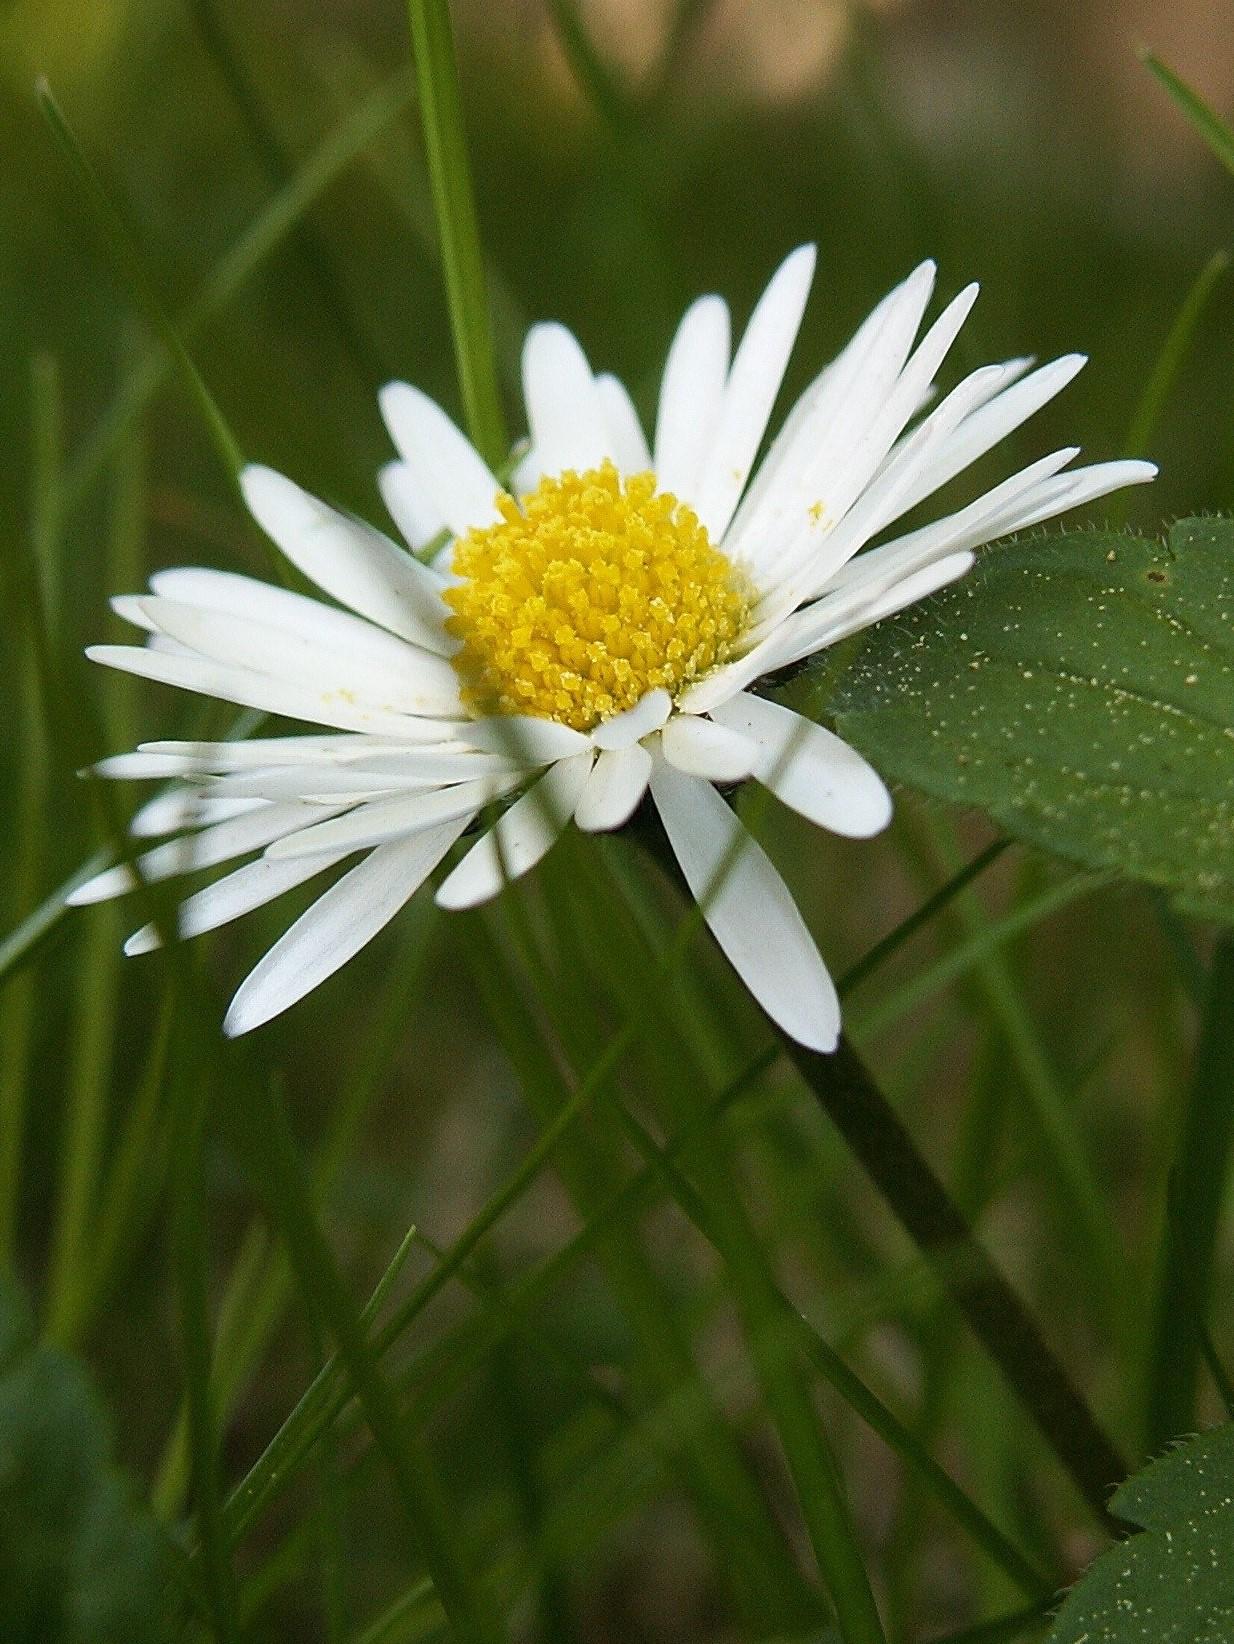 daisy-flower (2).jpg